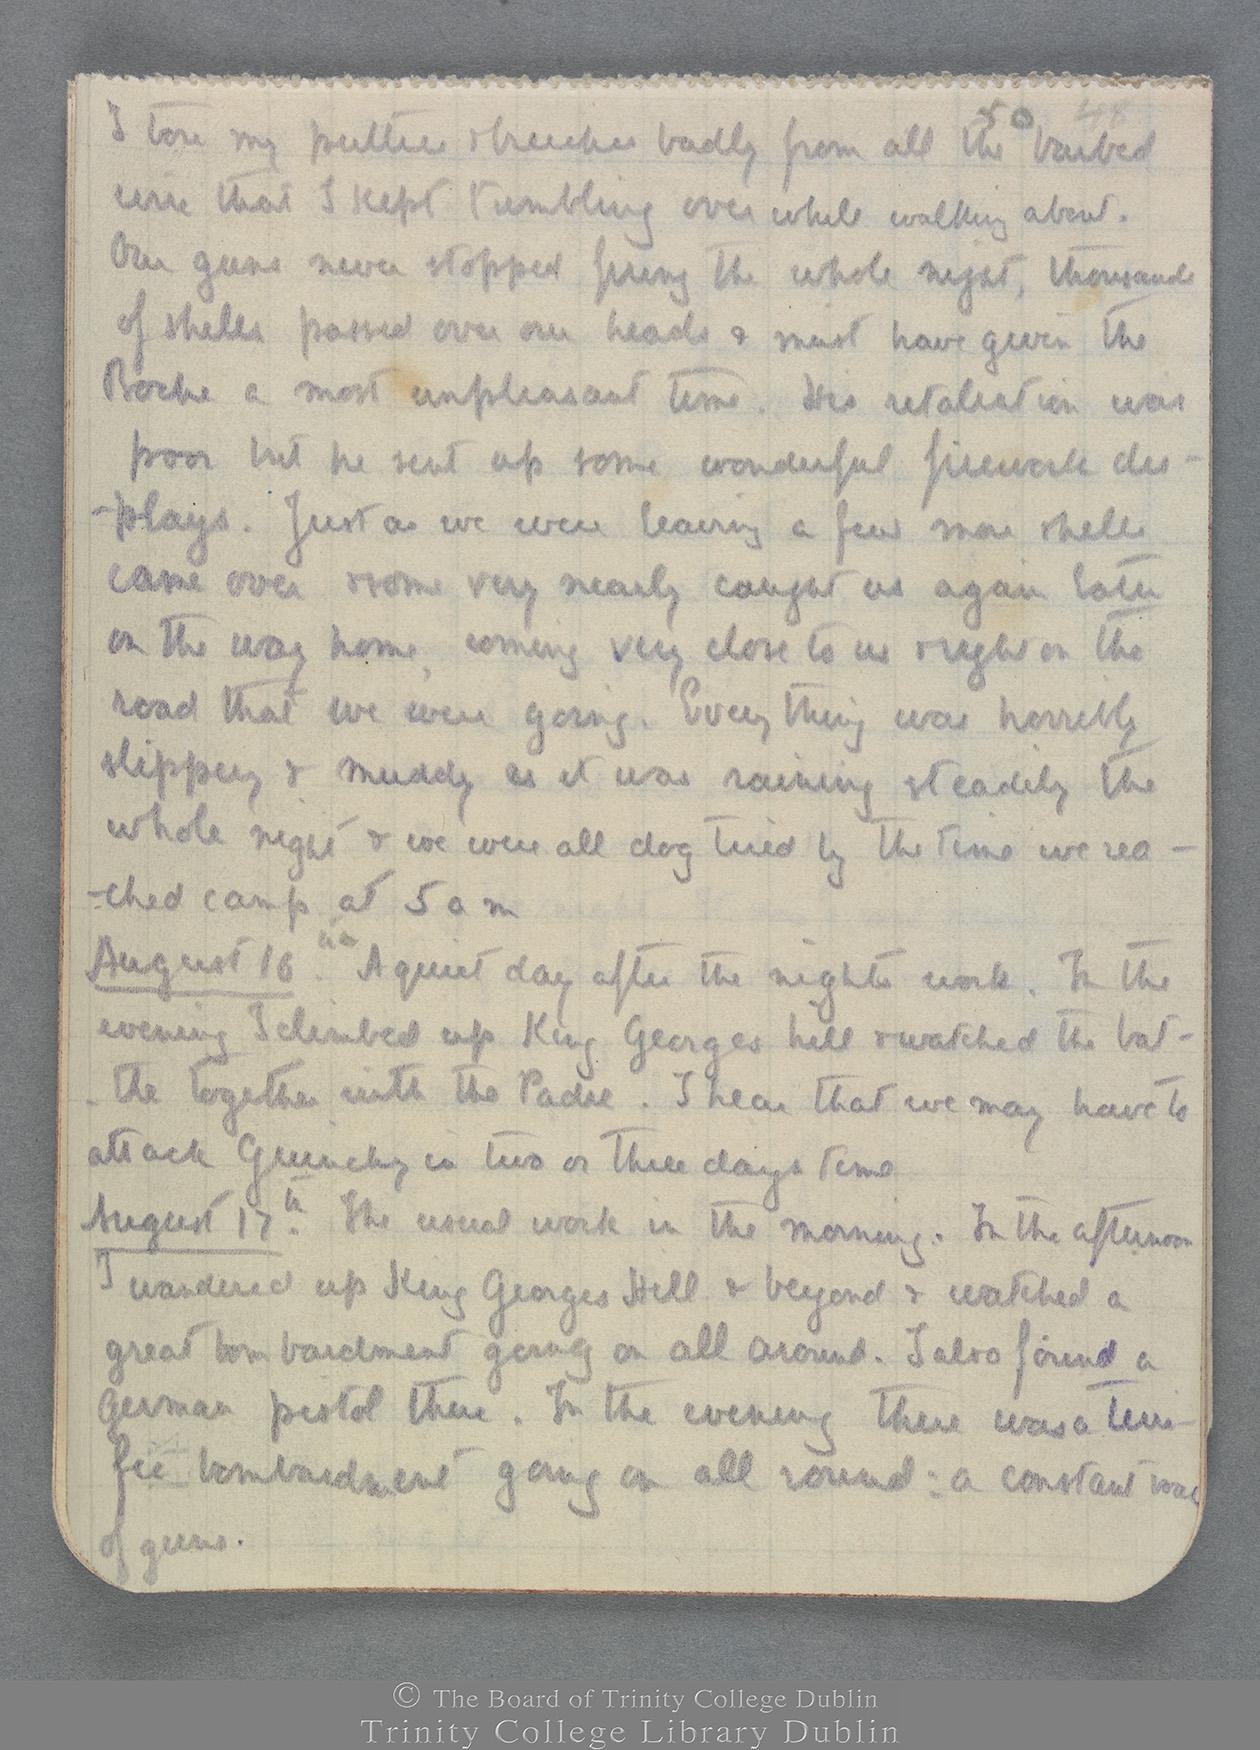 TCD MS 10821 folio 50 recto